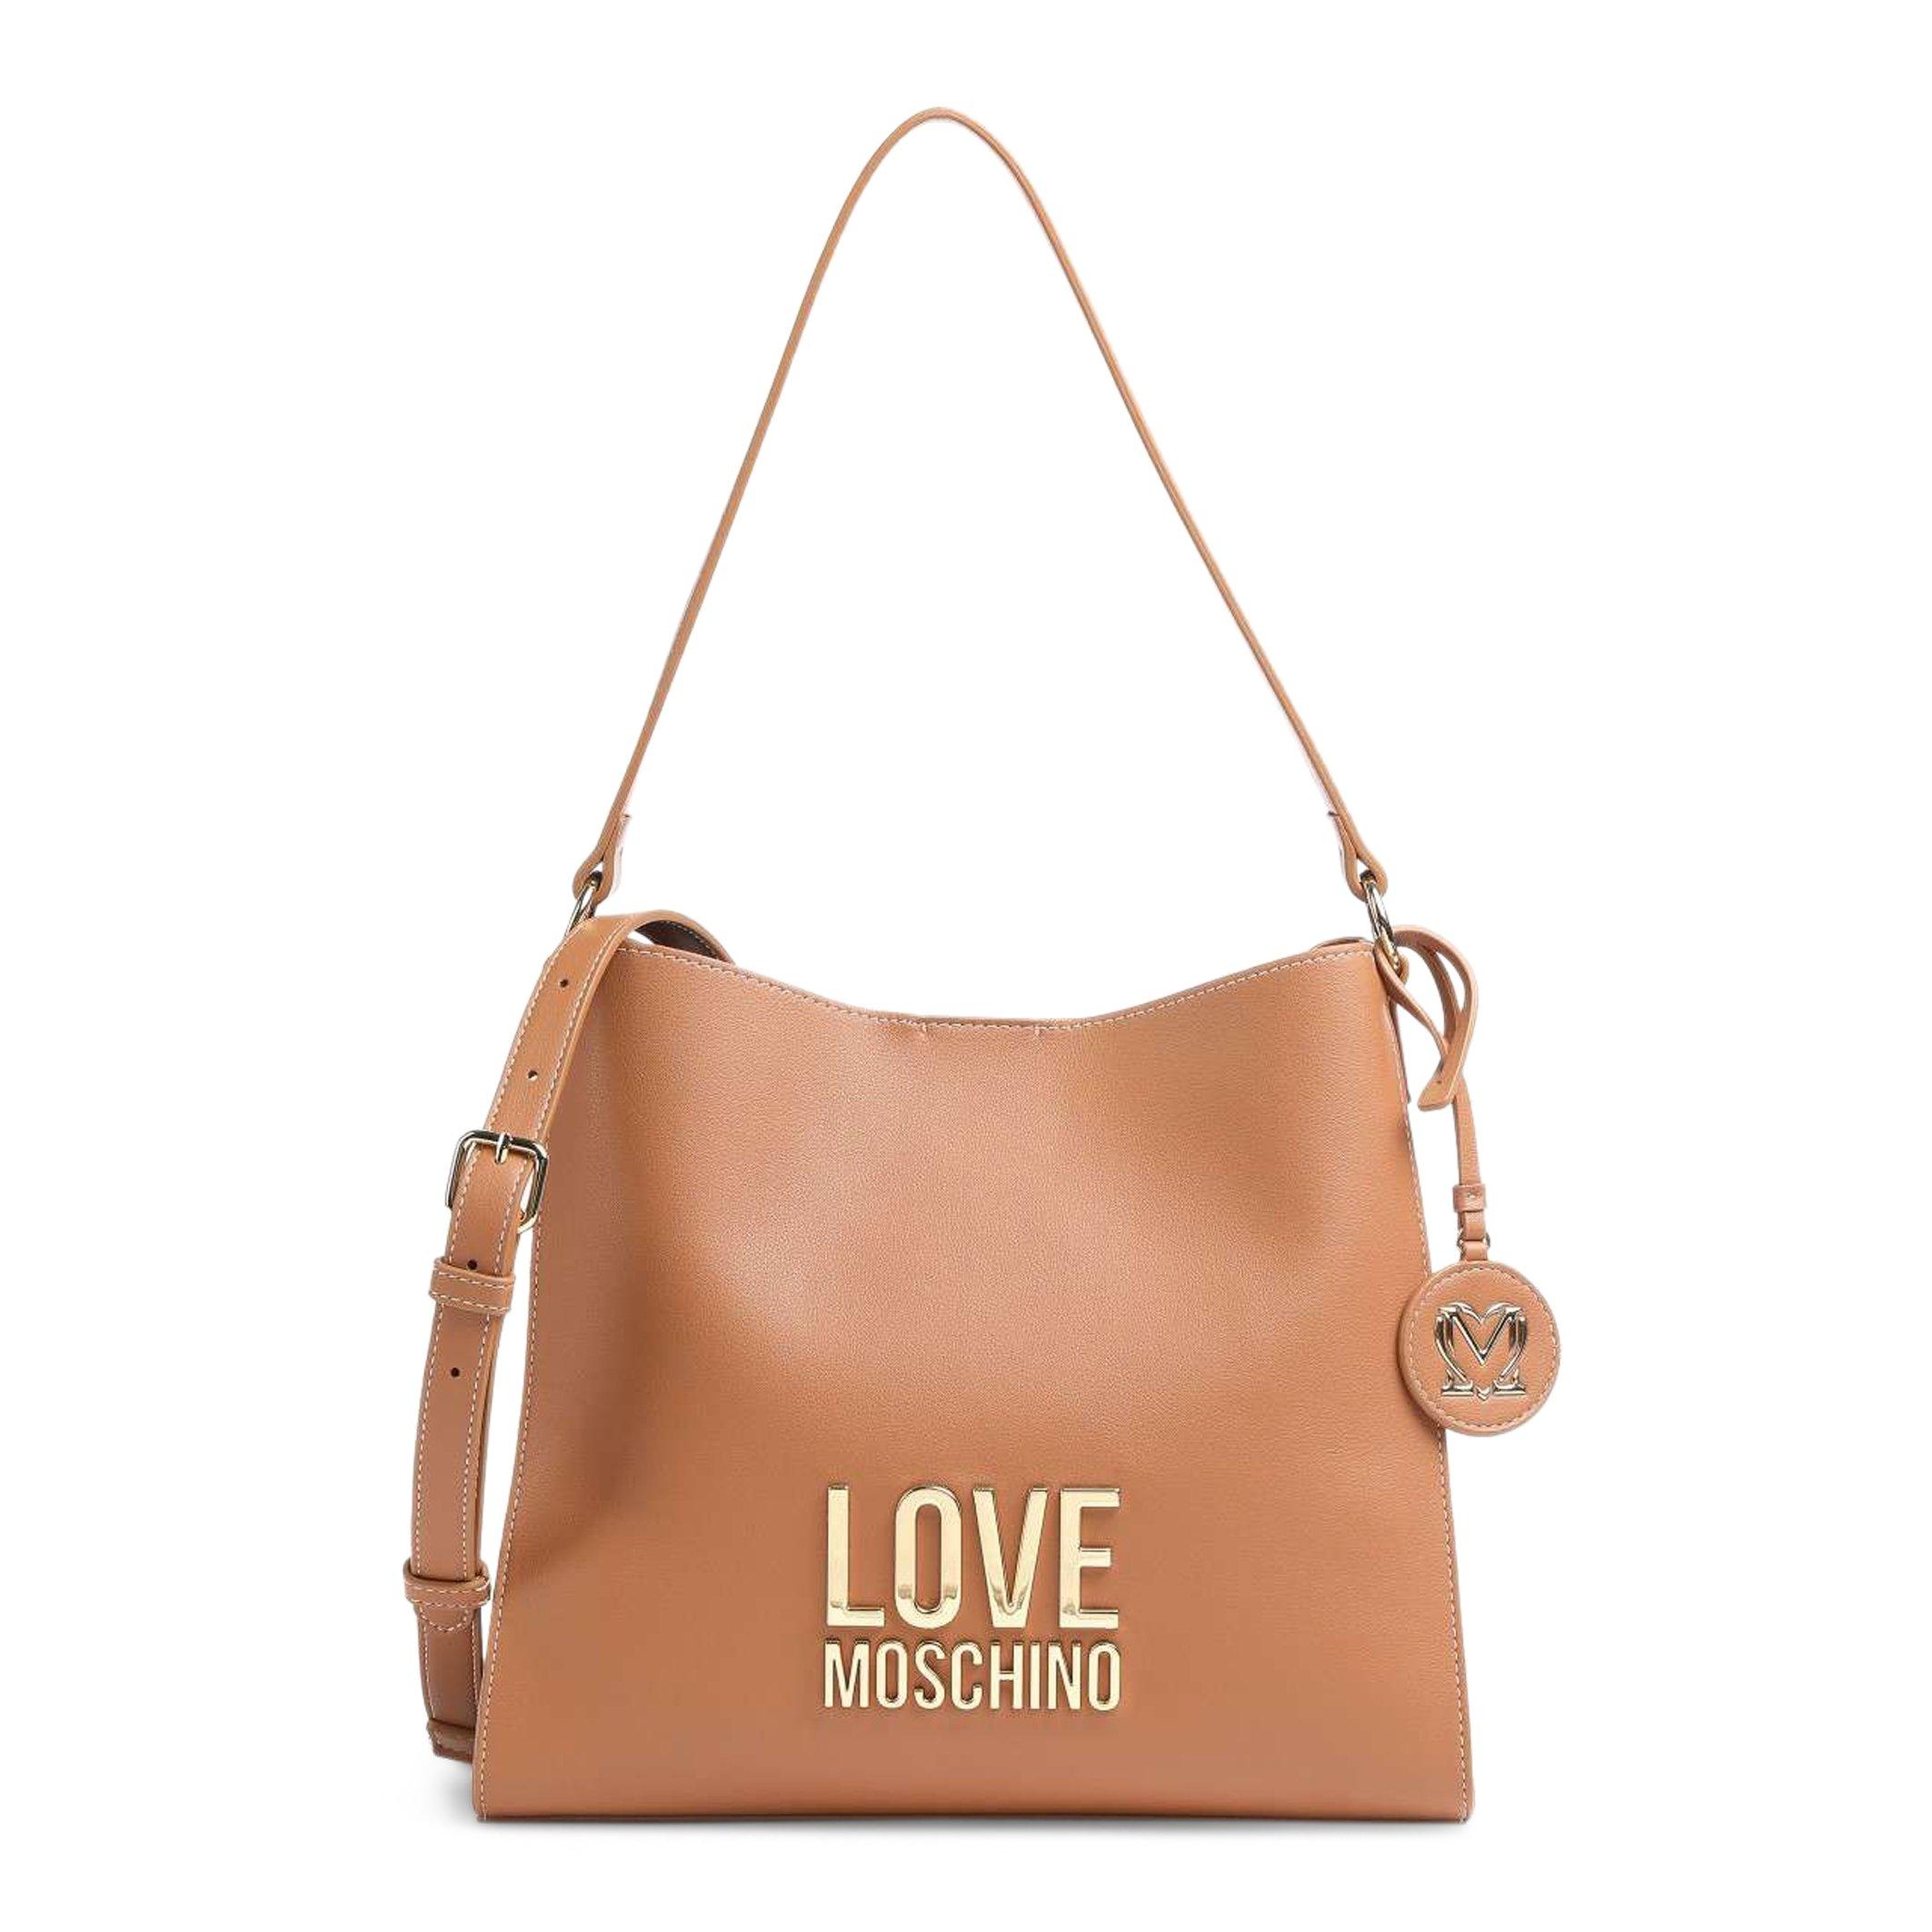 Love Moschino Women's Shoulder Bag Various Colours JC4191PP1DLJ0 - brown NOSIZE